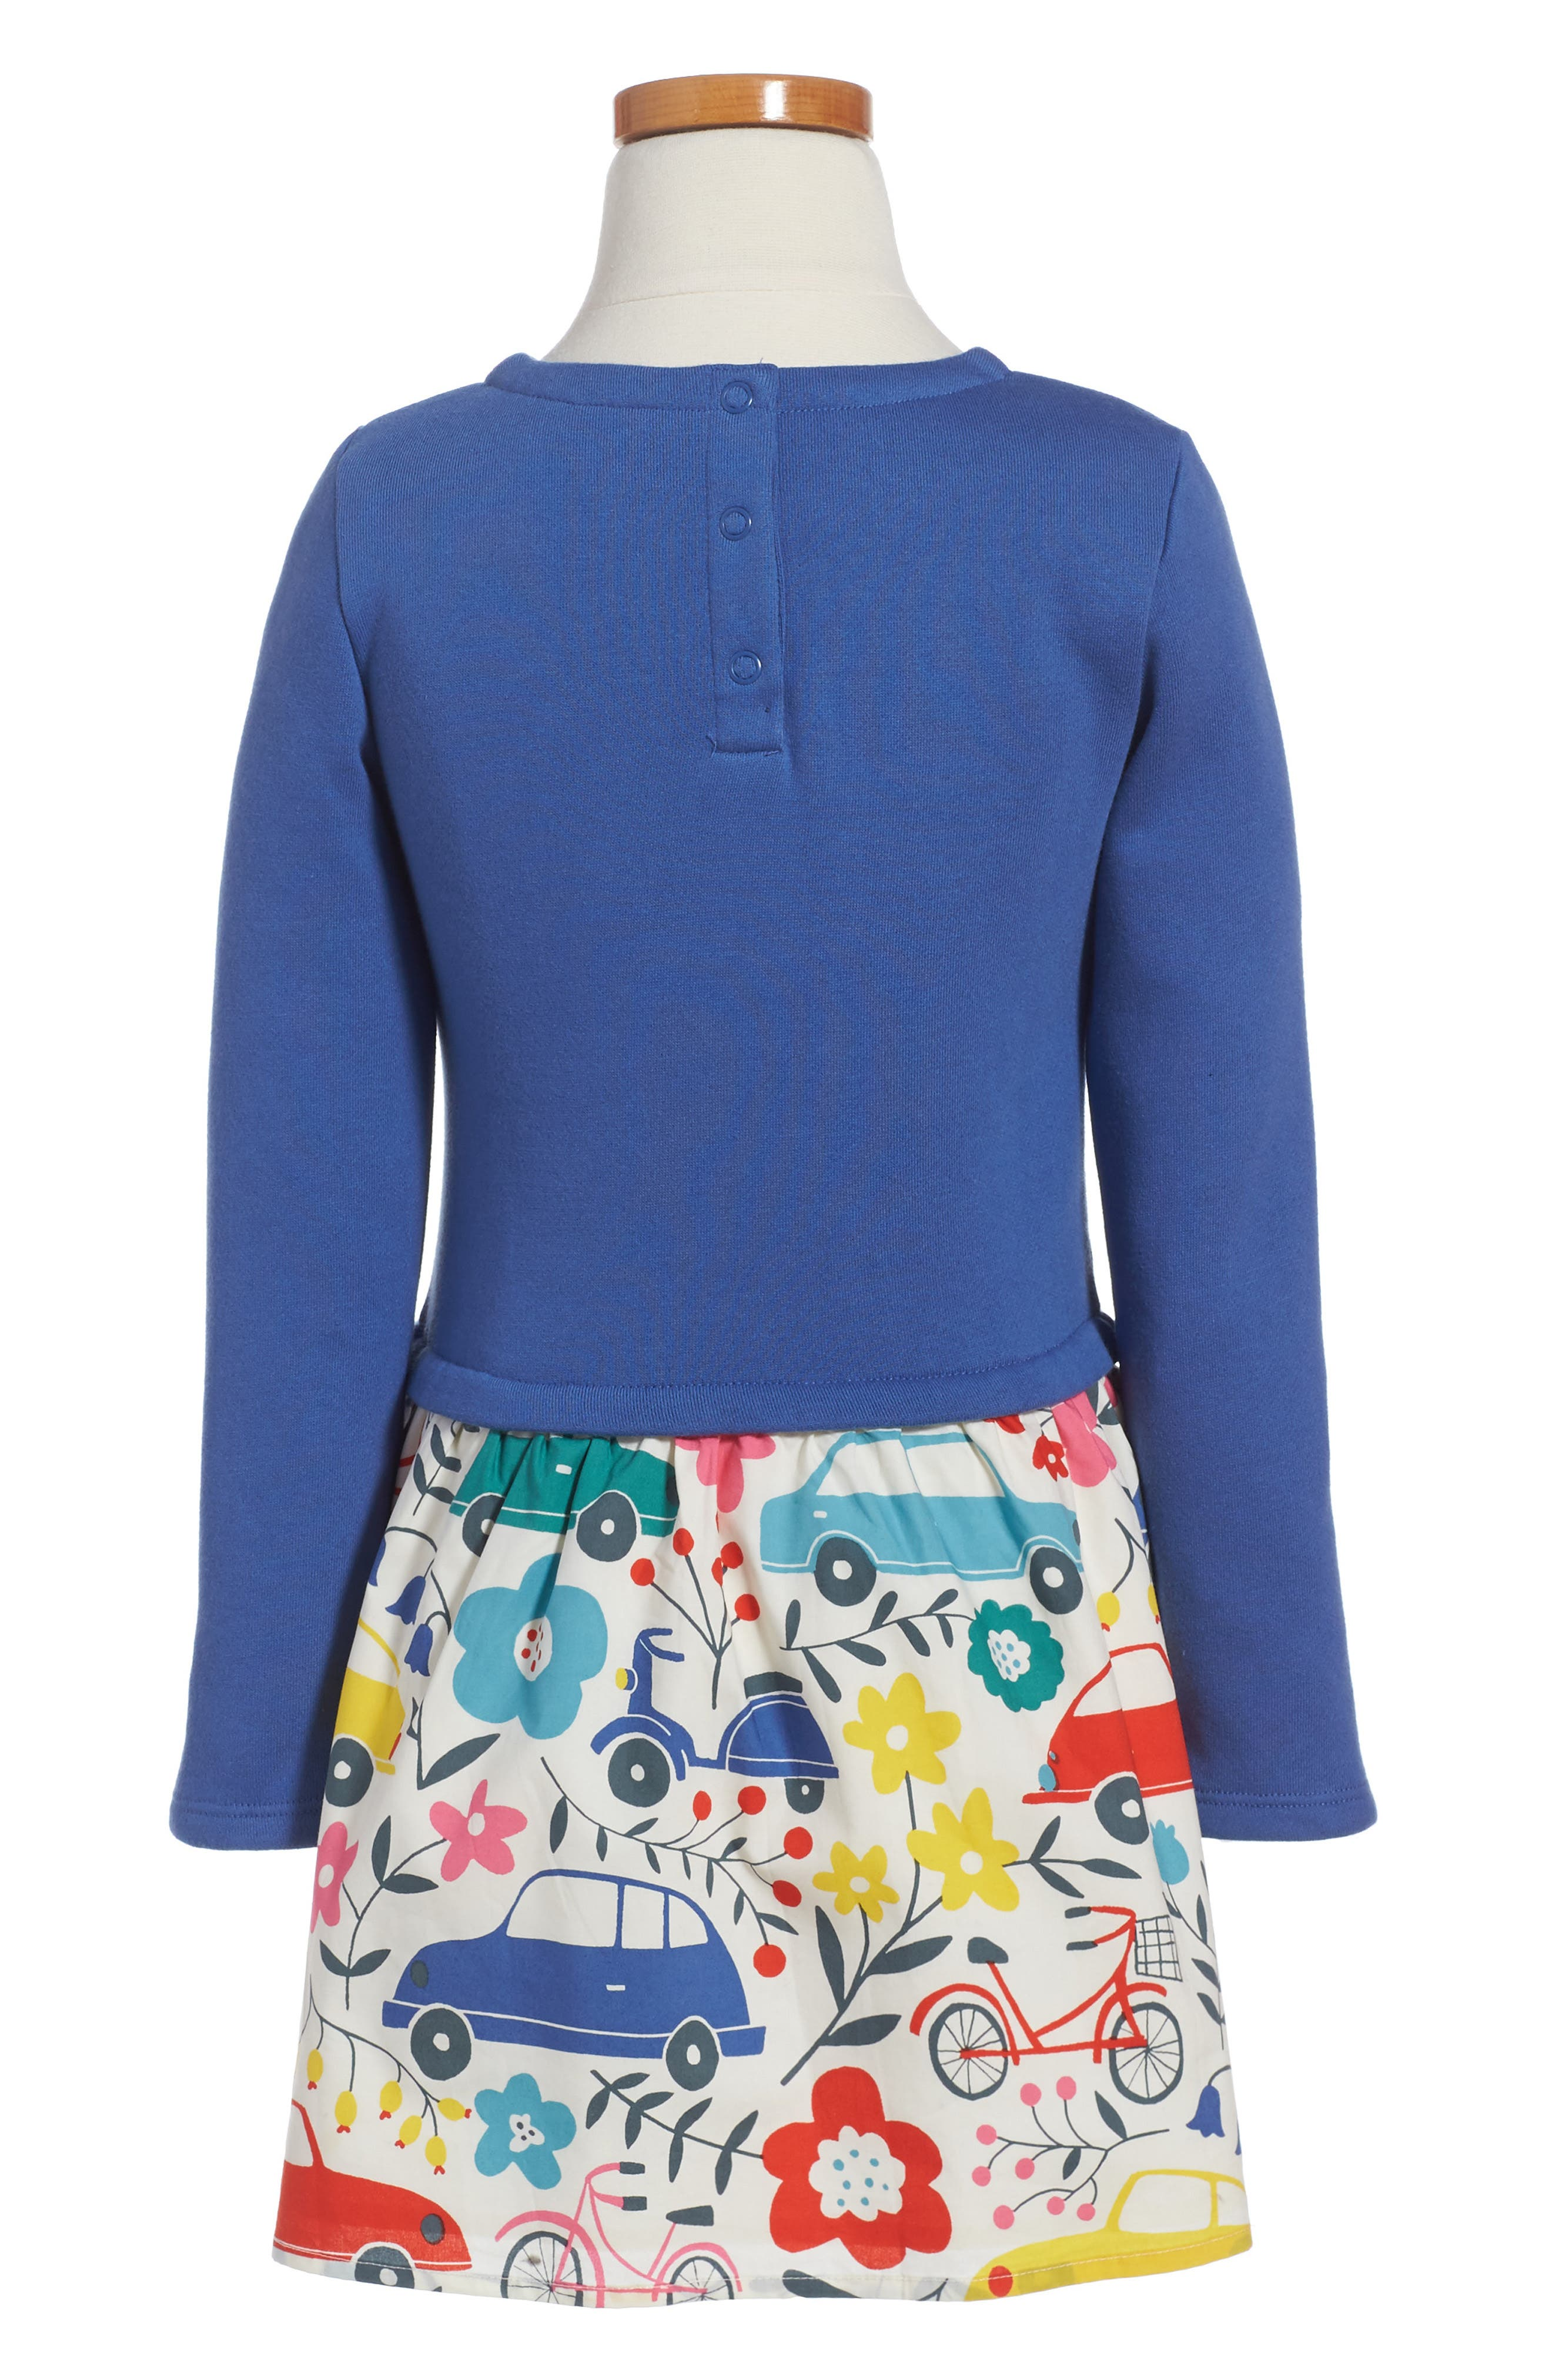 Alternate Image 2  - Mini Boden Sequin Appliqué Dress (Toddler Girls, Little Girls & Big Girls)